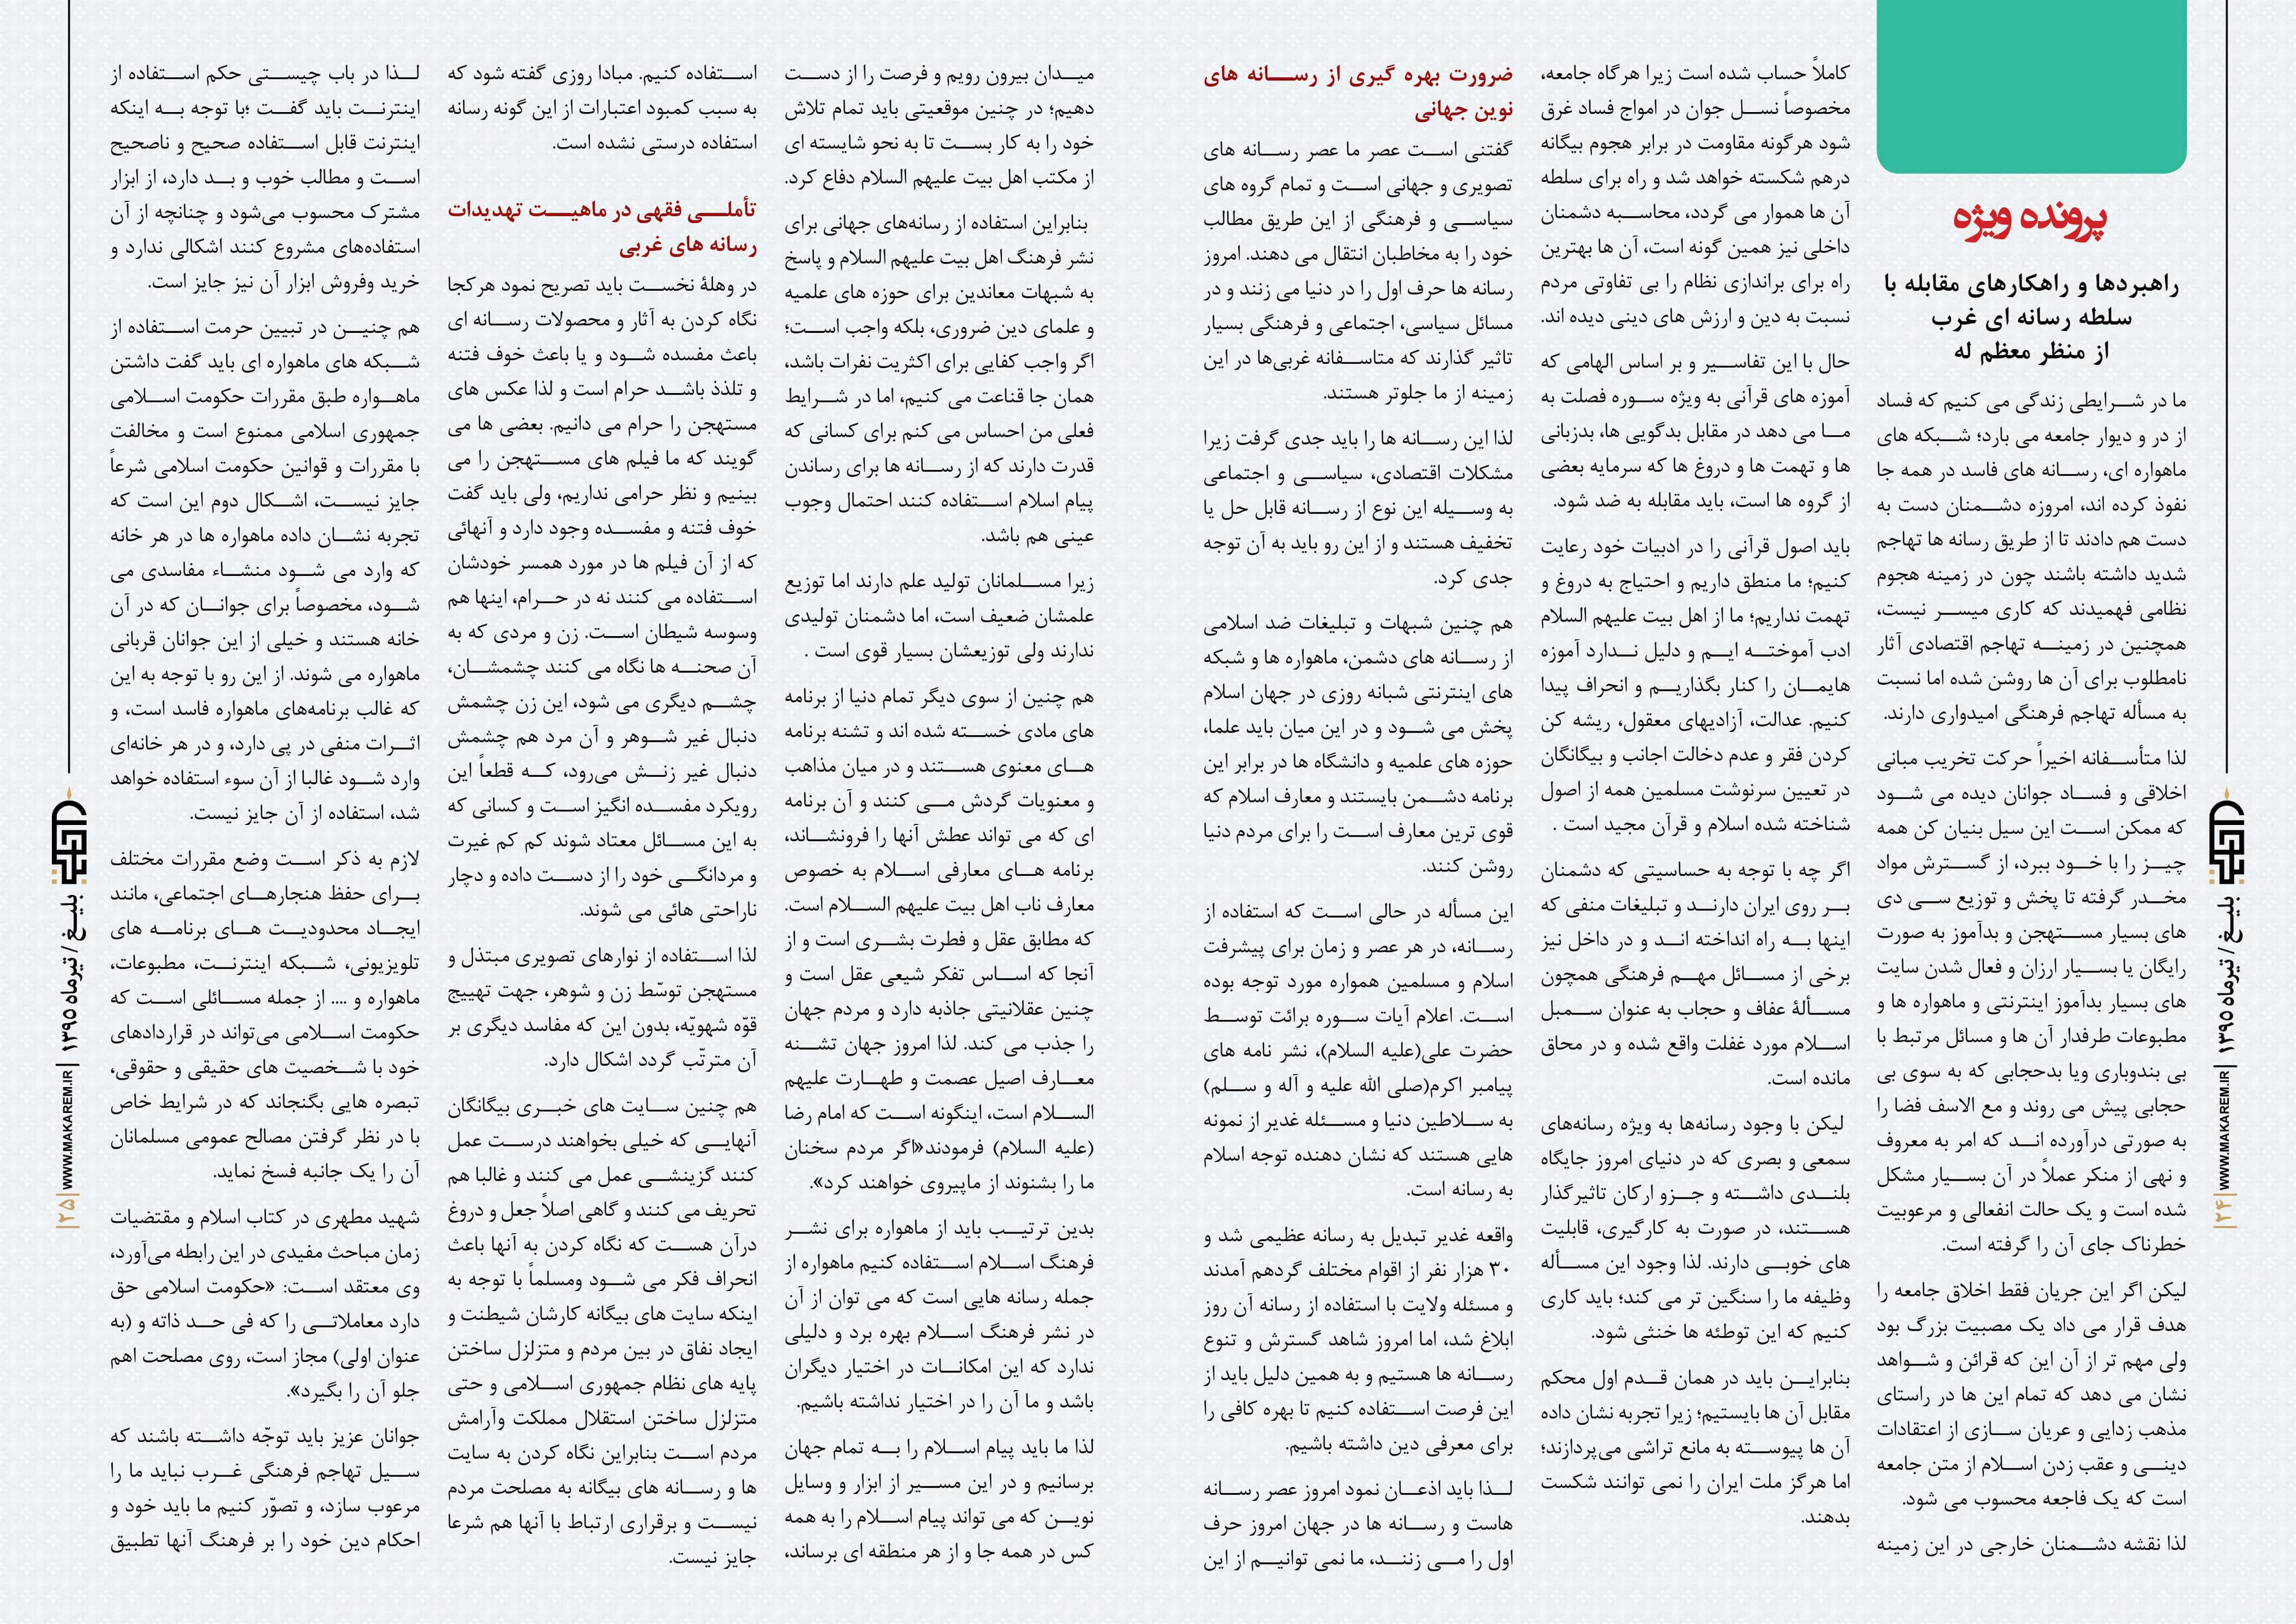 بلیغ 13-مدرسه الامام امیر المومنین (ع)